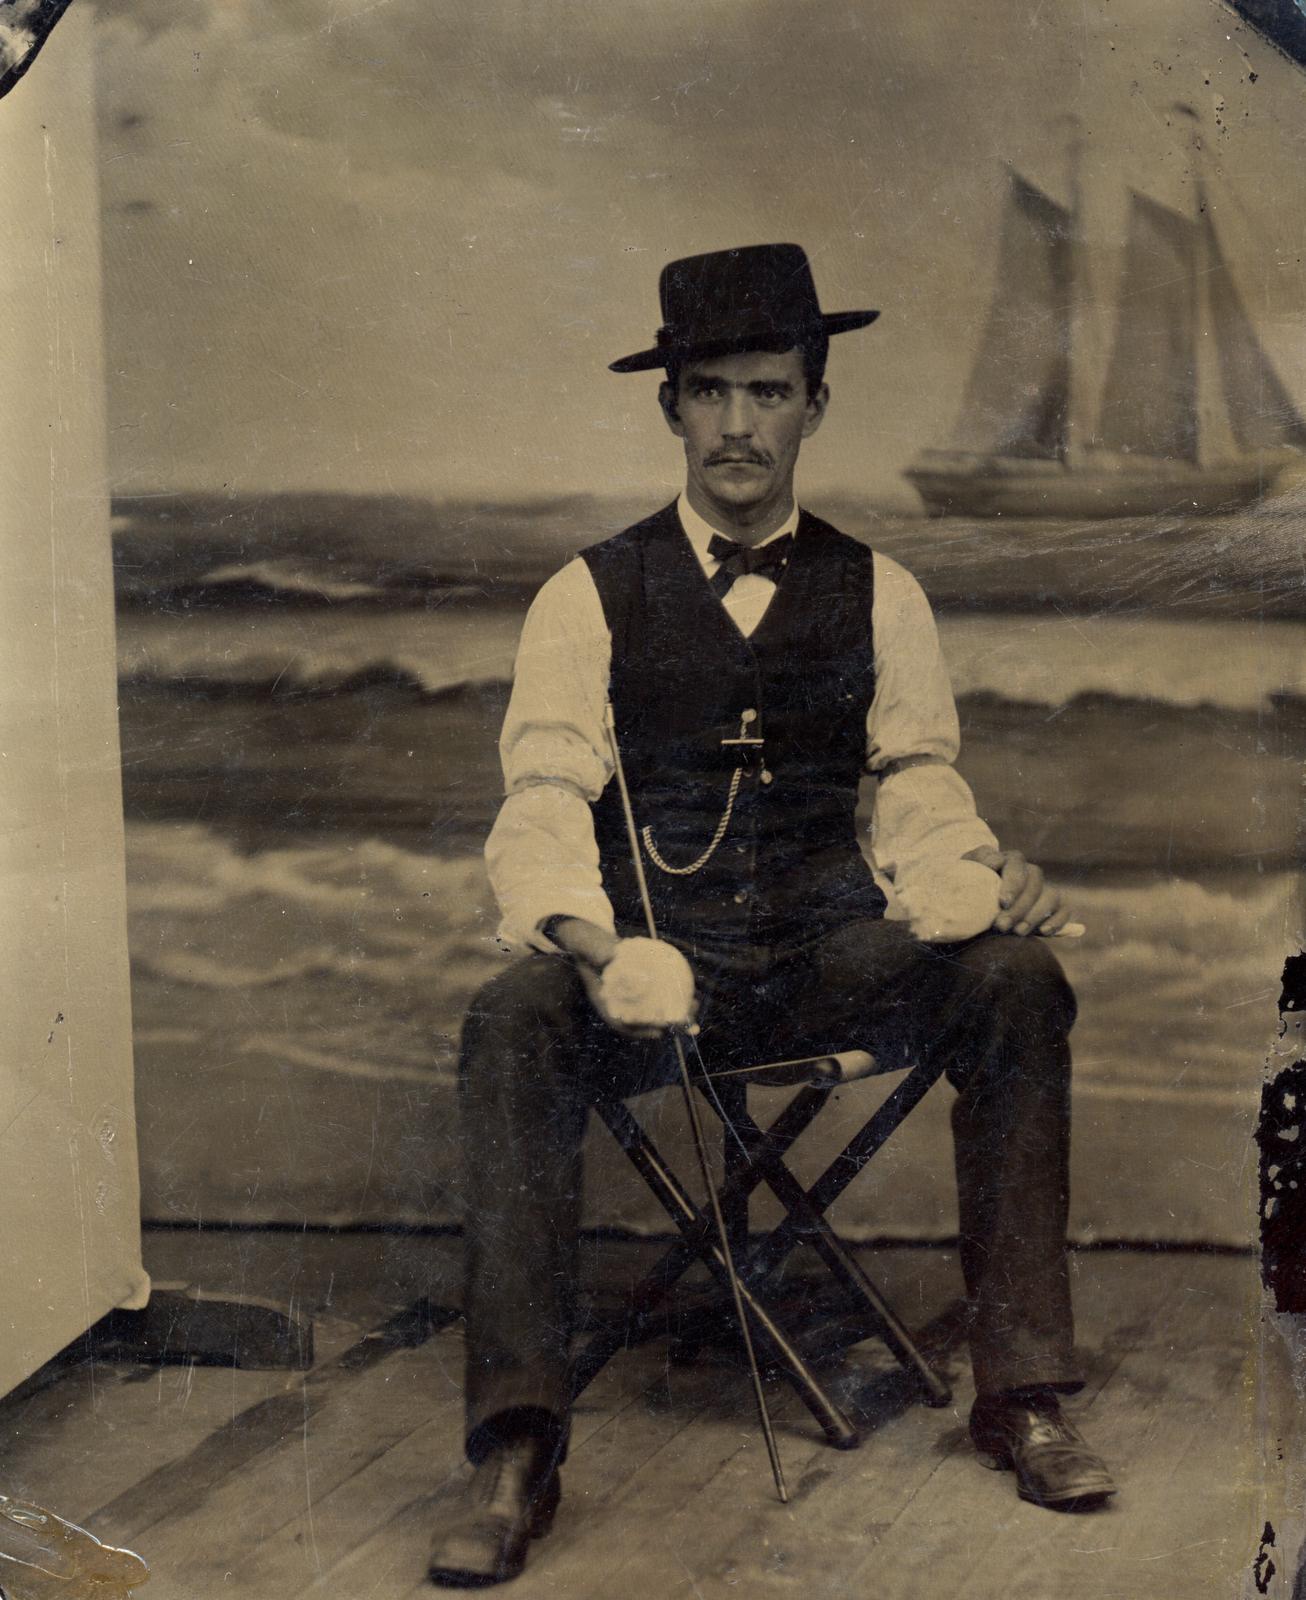 Vintage man photo